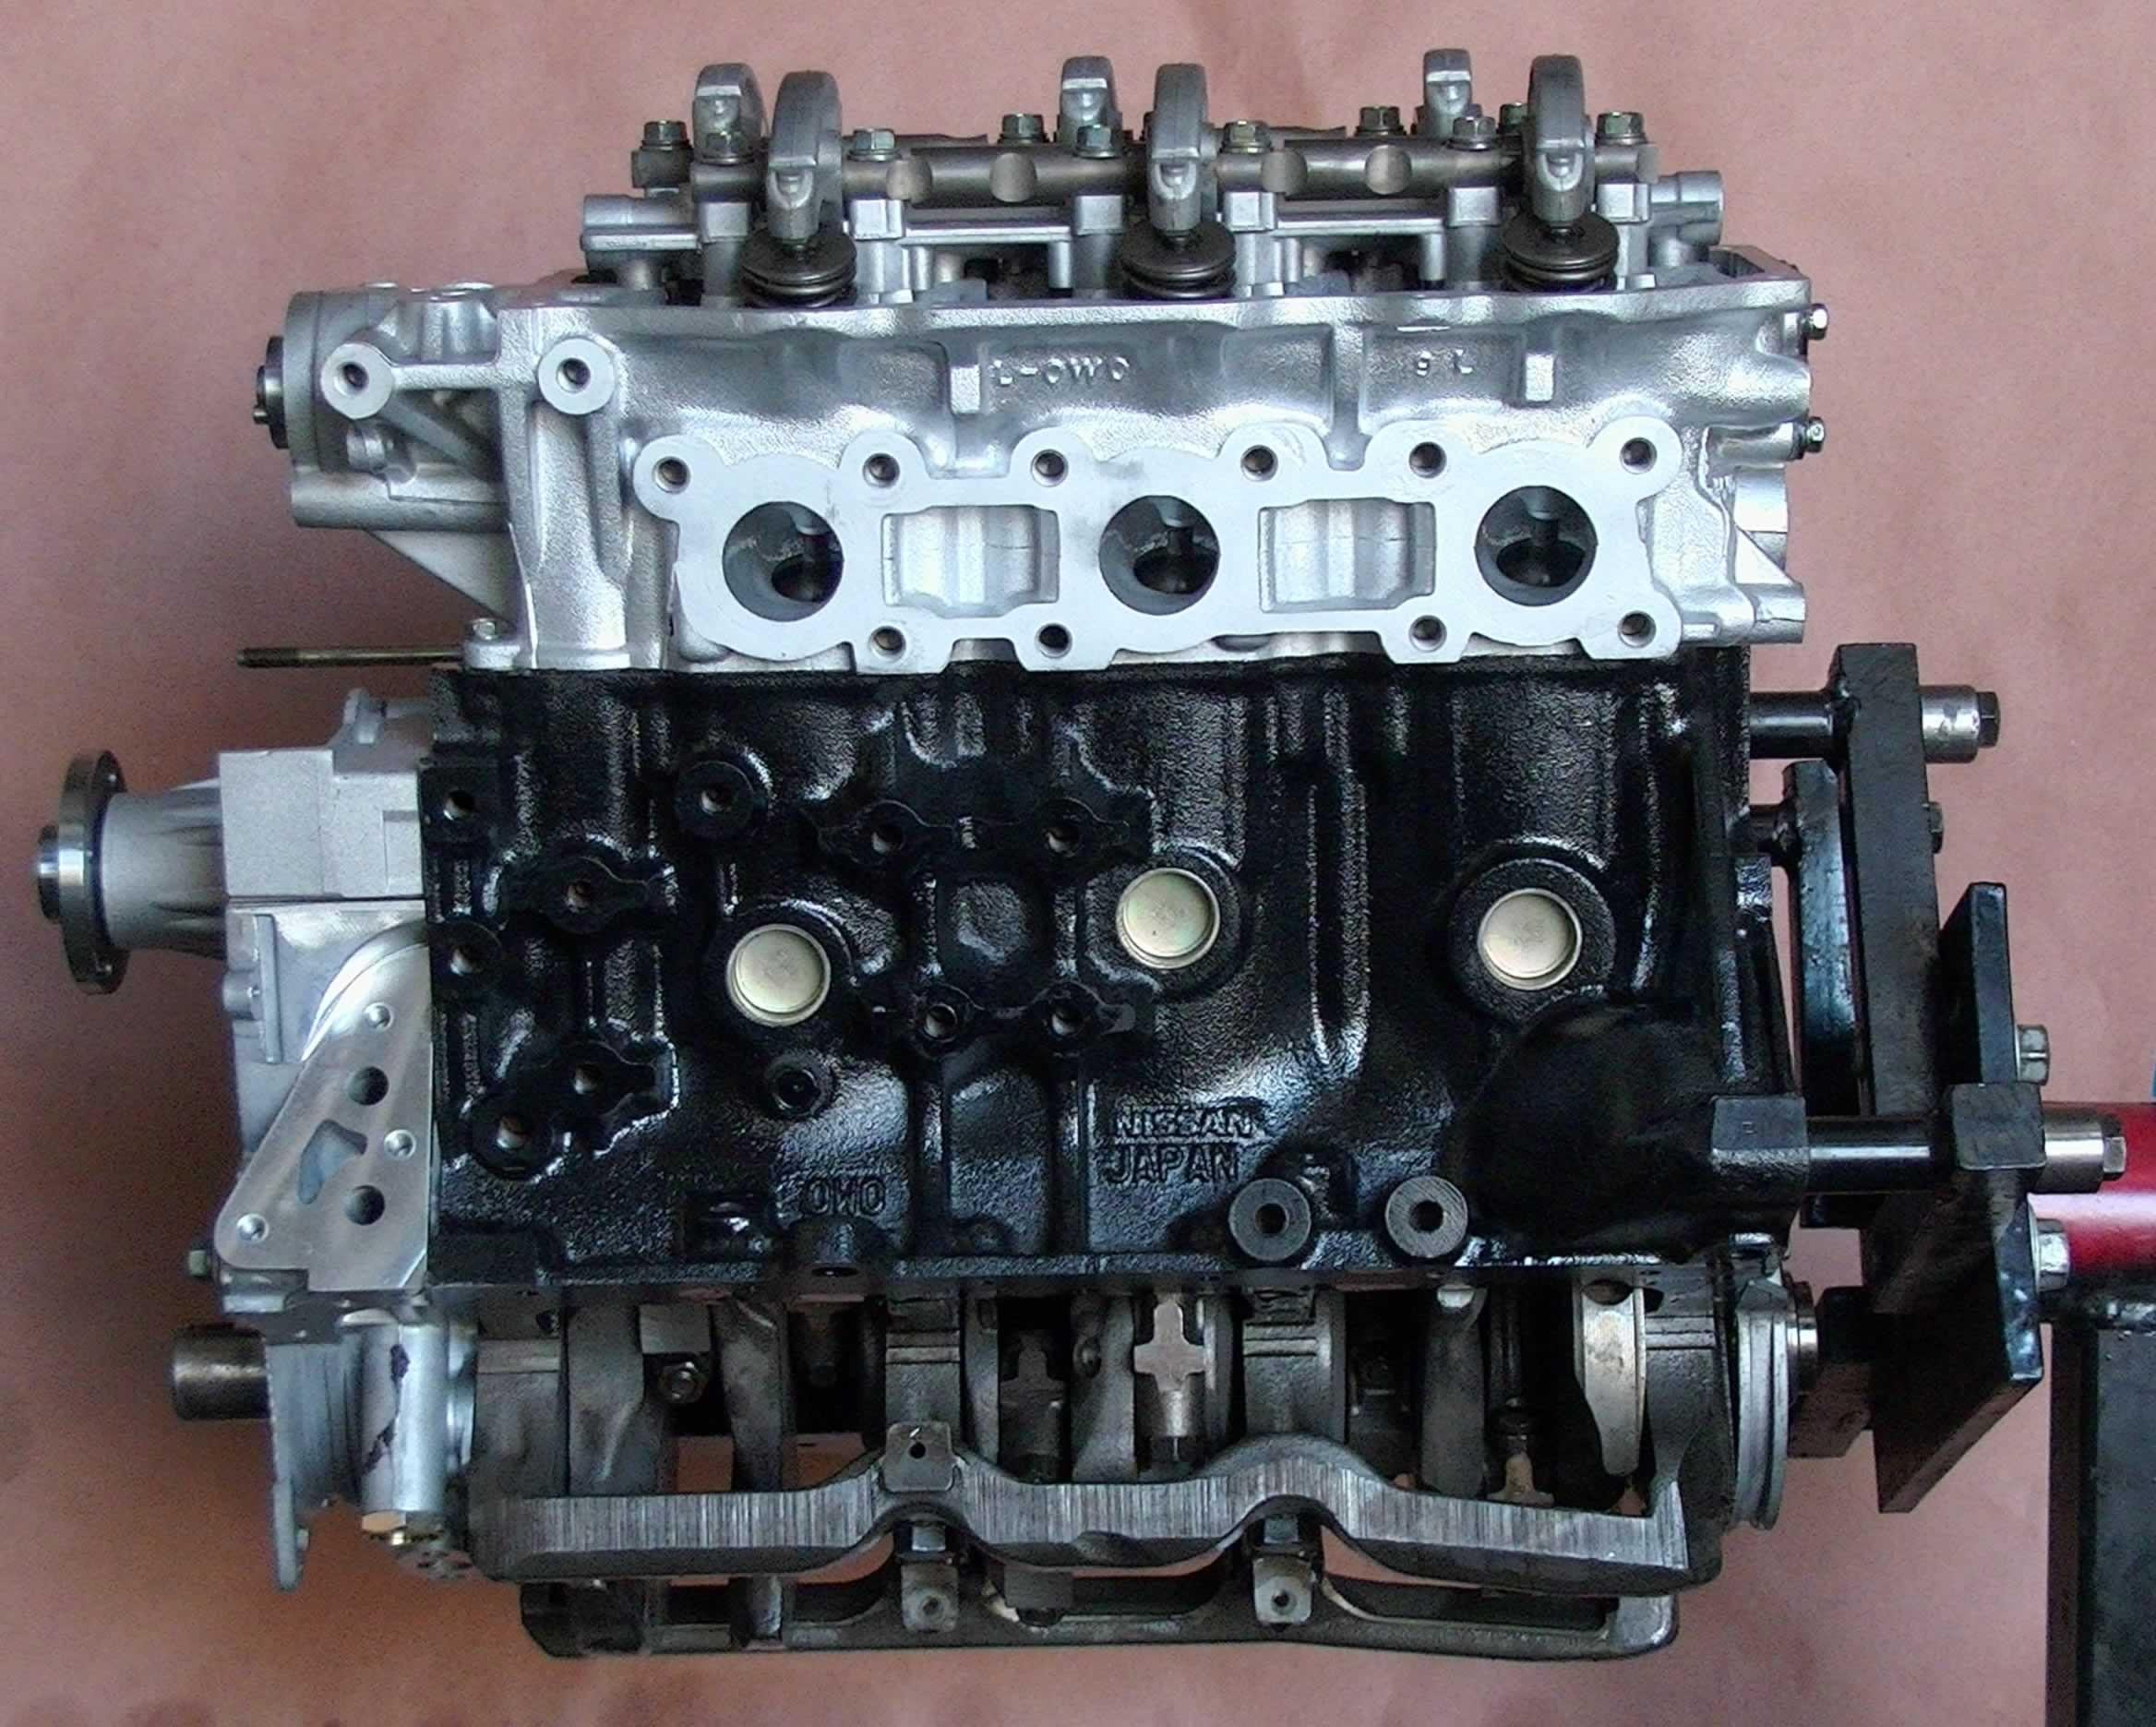 Pictures Of Back Of 2000 Xterra Engine Rebuilt 2000 Nissan Xterra 3 3l Vg33e Longblock Engine Kar King Auto Of Pictures Of Back Of 2000 Xterra Engine